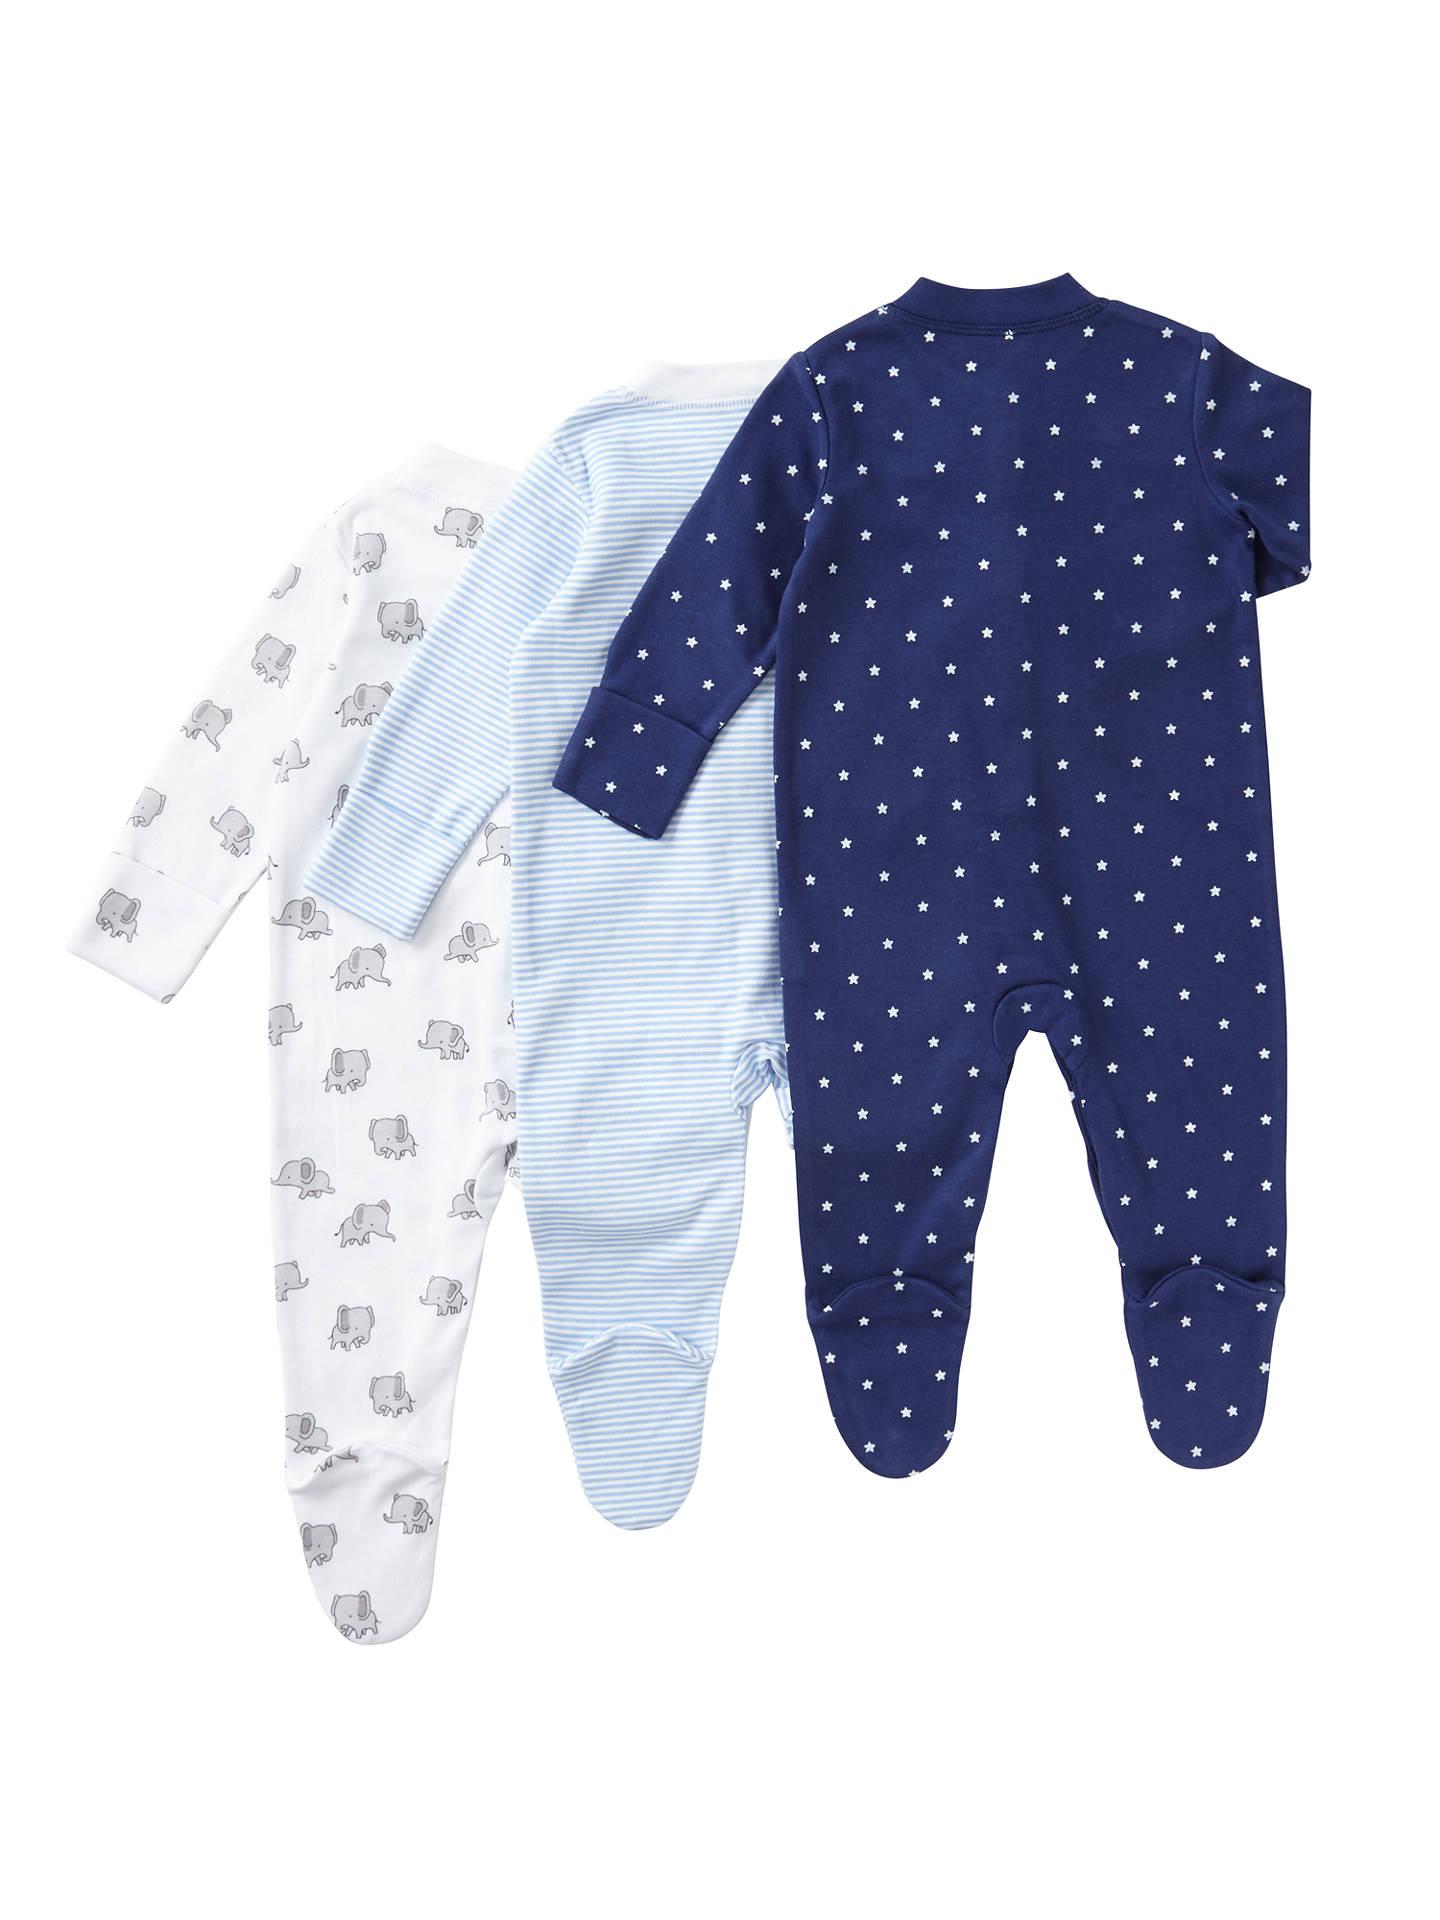 lewis john gots sleepsuit elephant organic cotton sleeve pack stars partners johnlewis